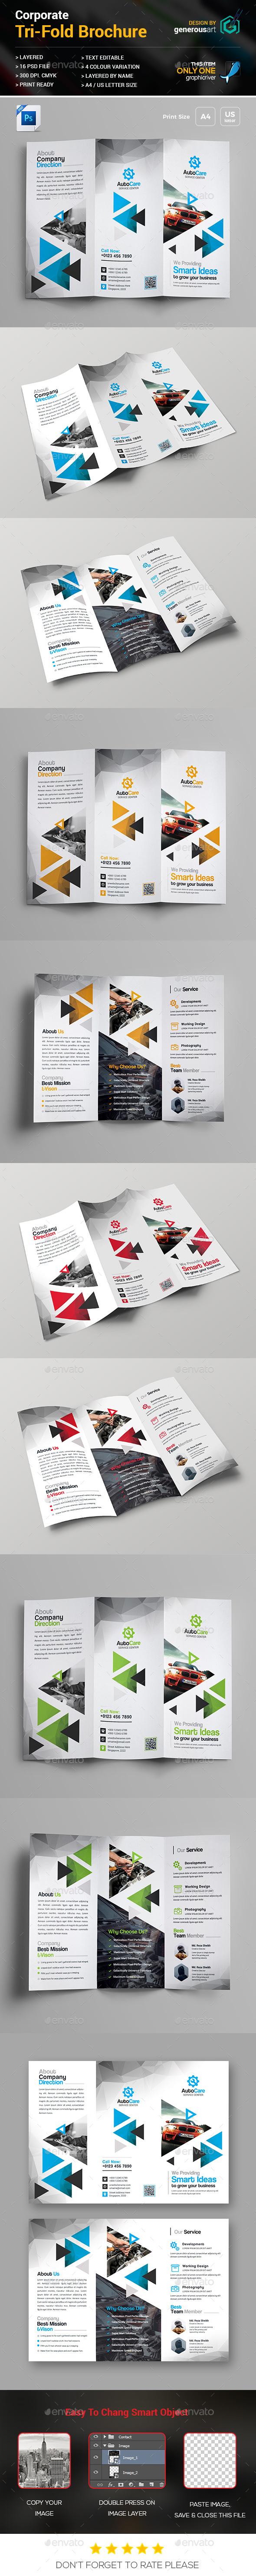 Car Service Tri-Fold Brochure - Brochures Print Templates